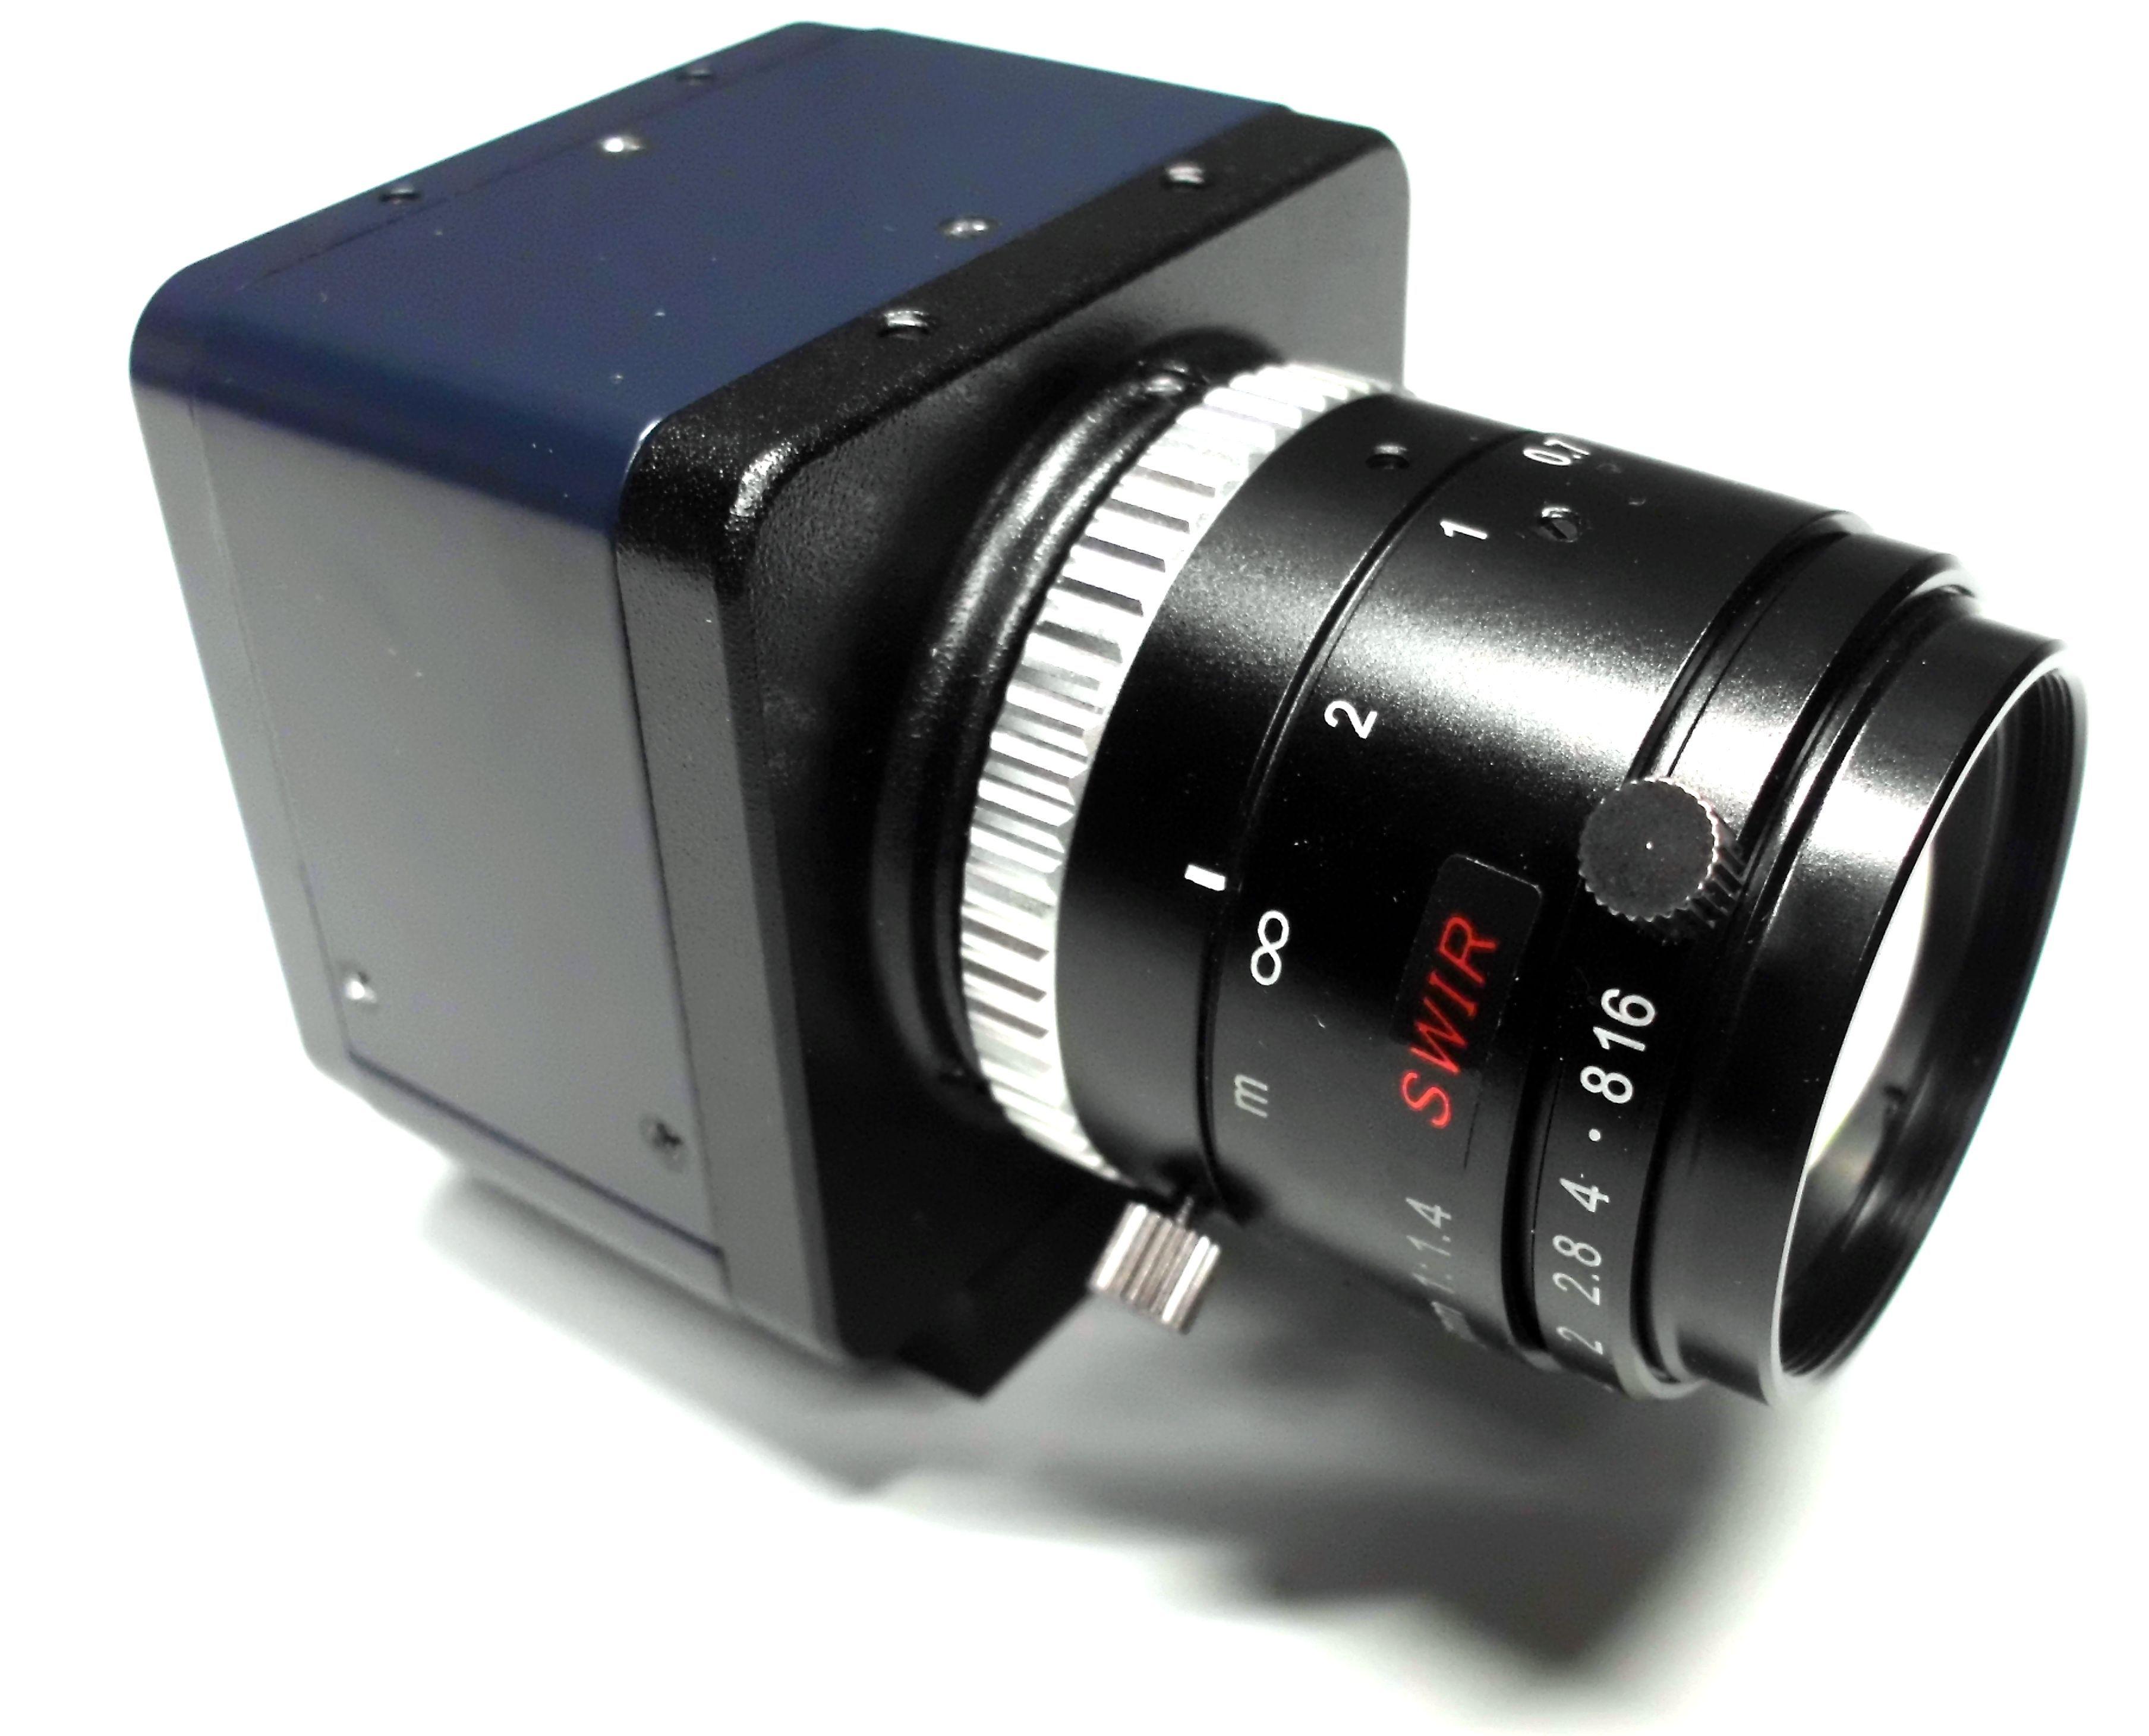 Nir Camera Usb